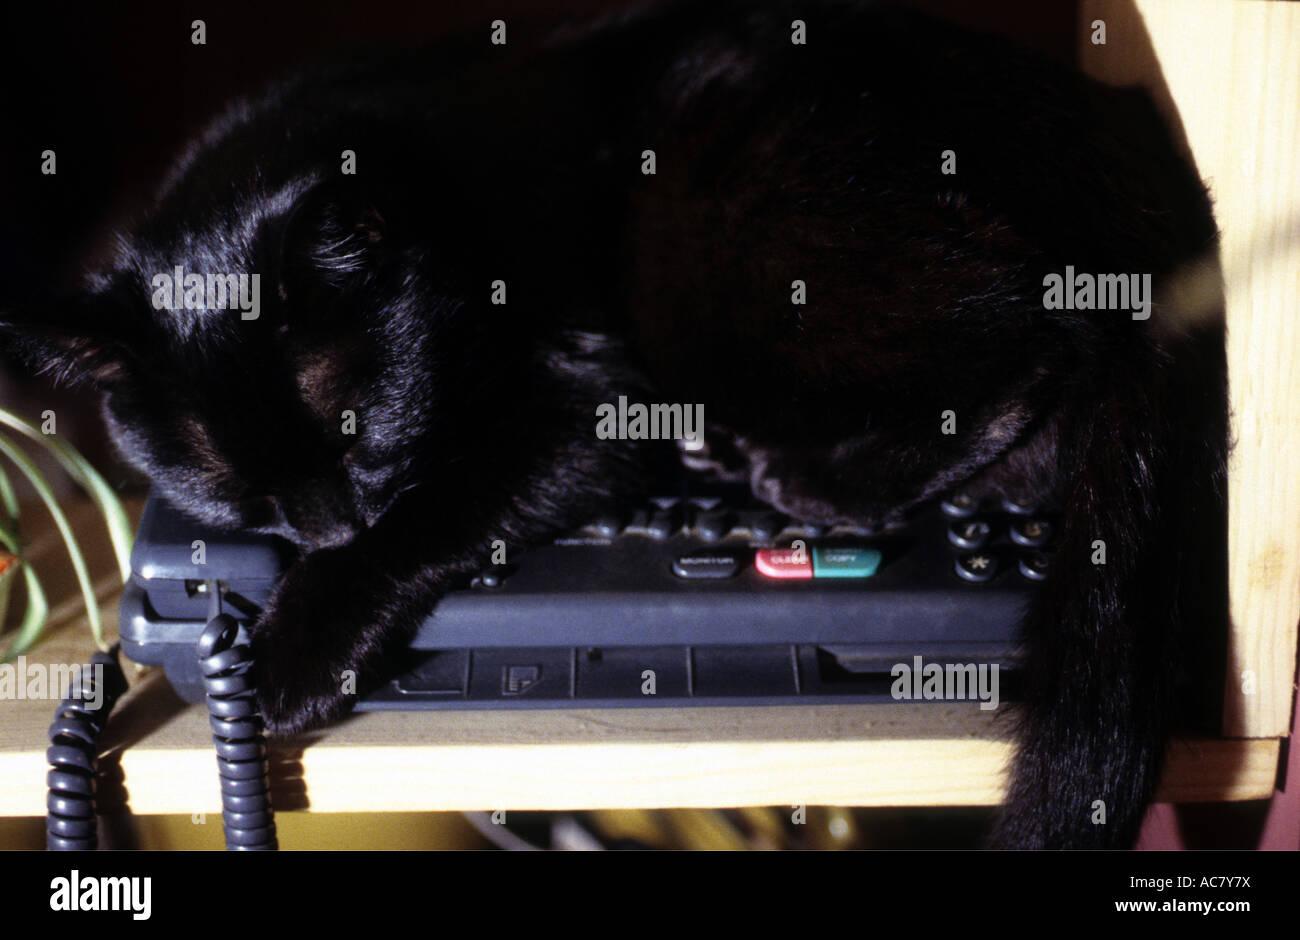 pet cat sleeping on